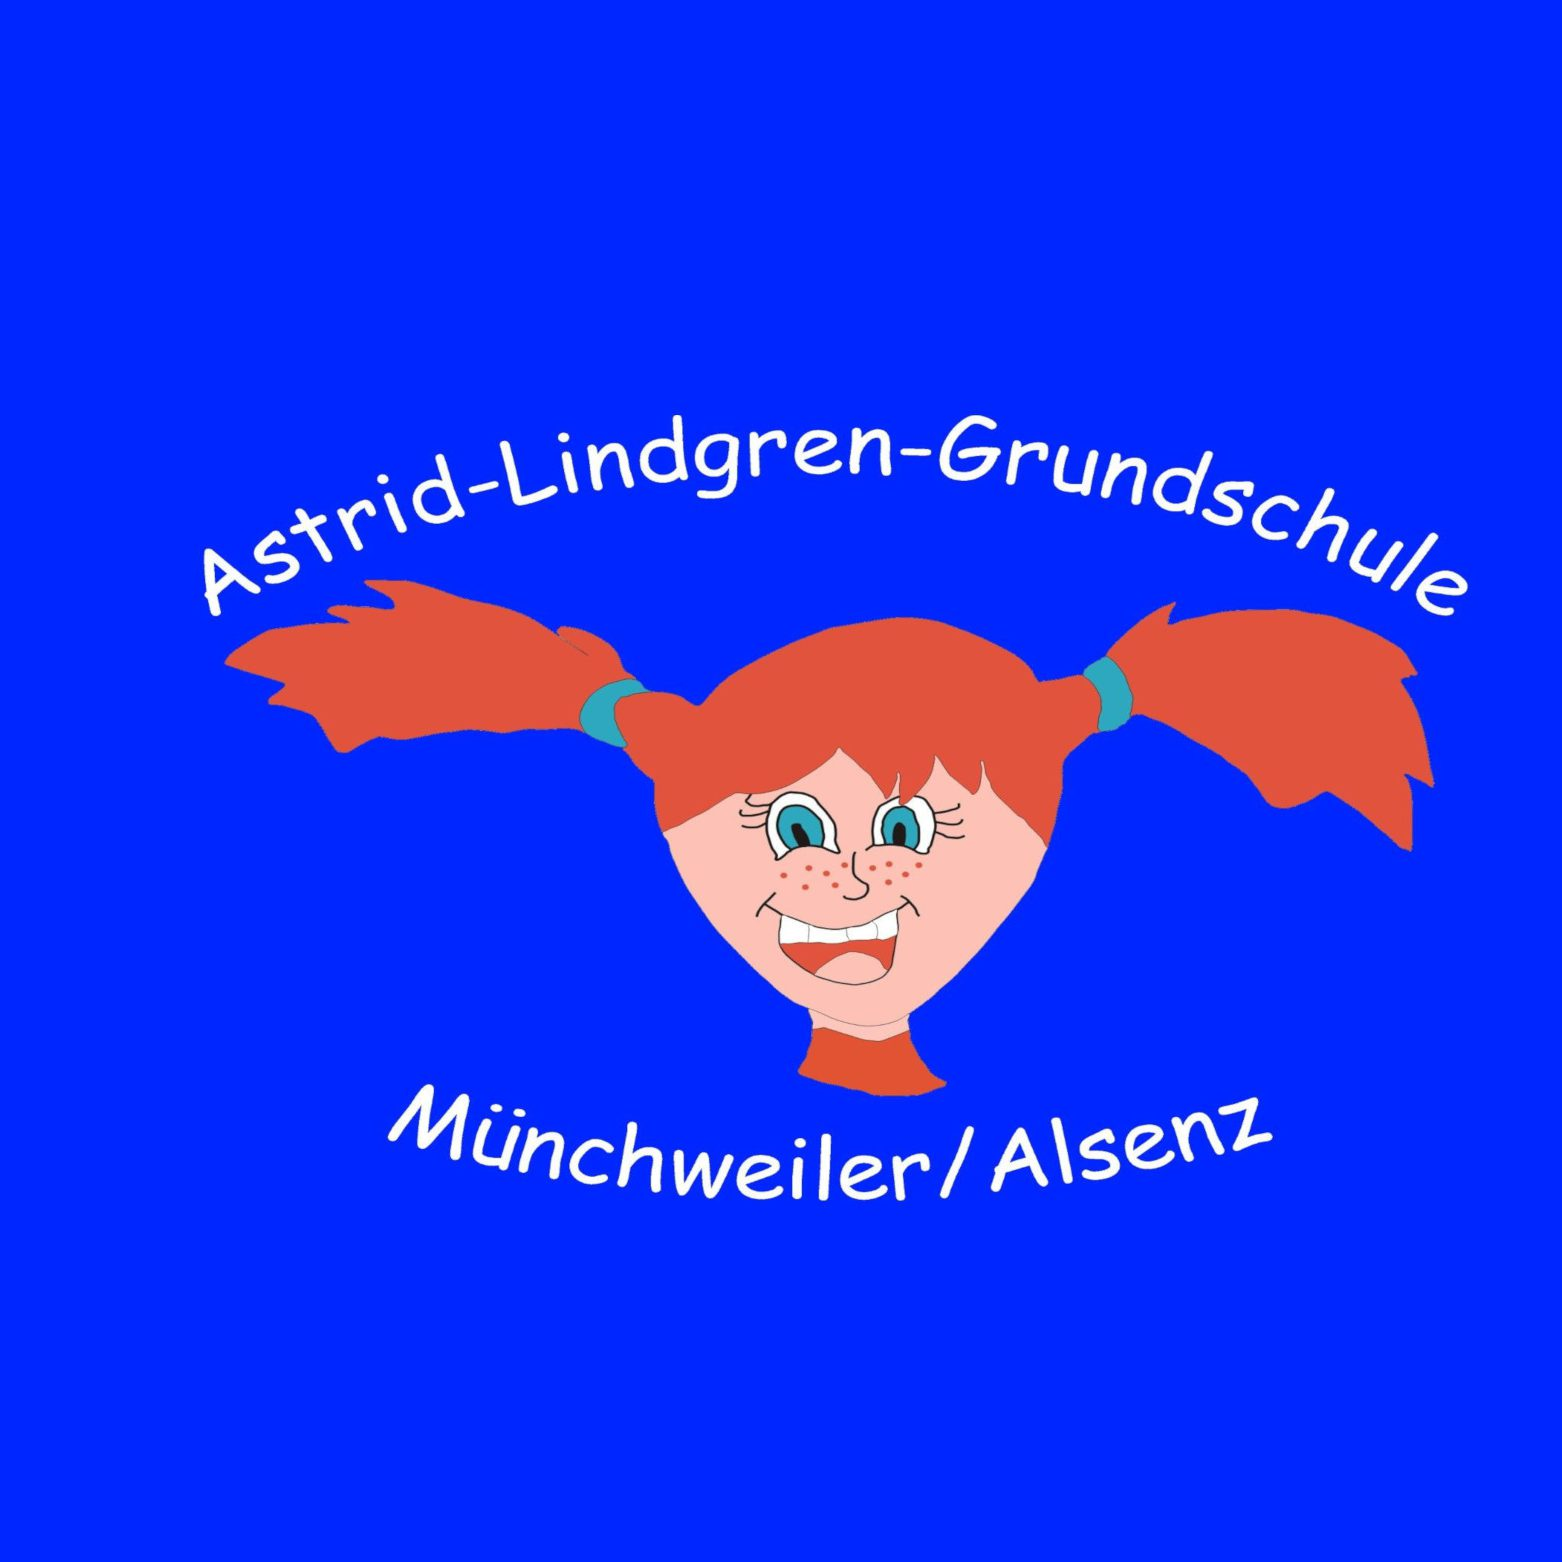 Astrid-Lindgren-Grundschule